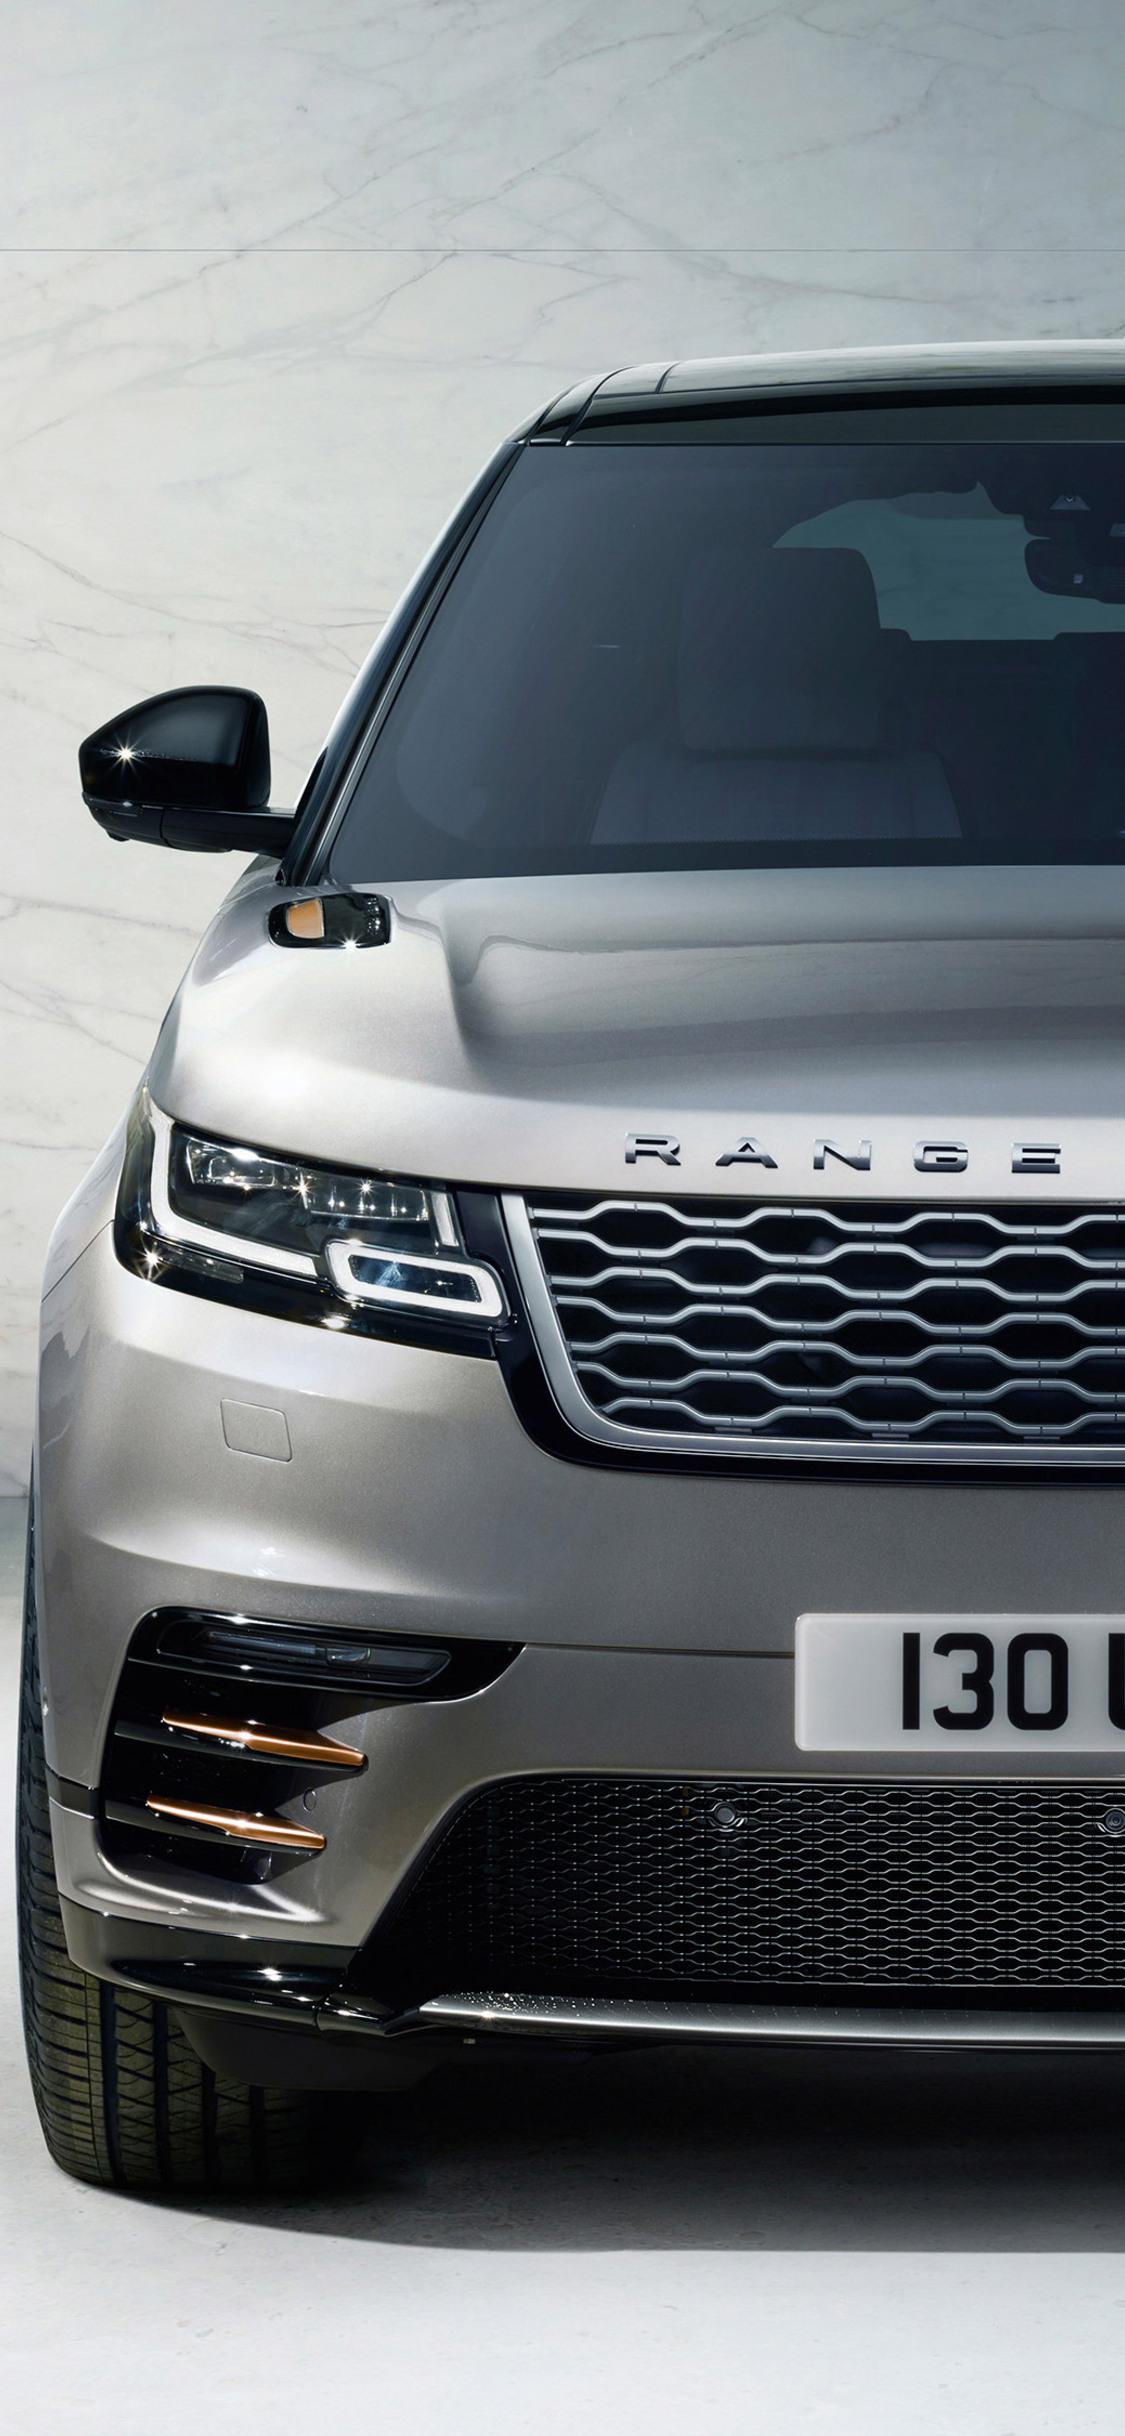 1125x2436 Range Rover Velar 2018 Iphone Xs Iphone 10 Iphone X Hd 4k